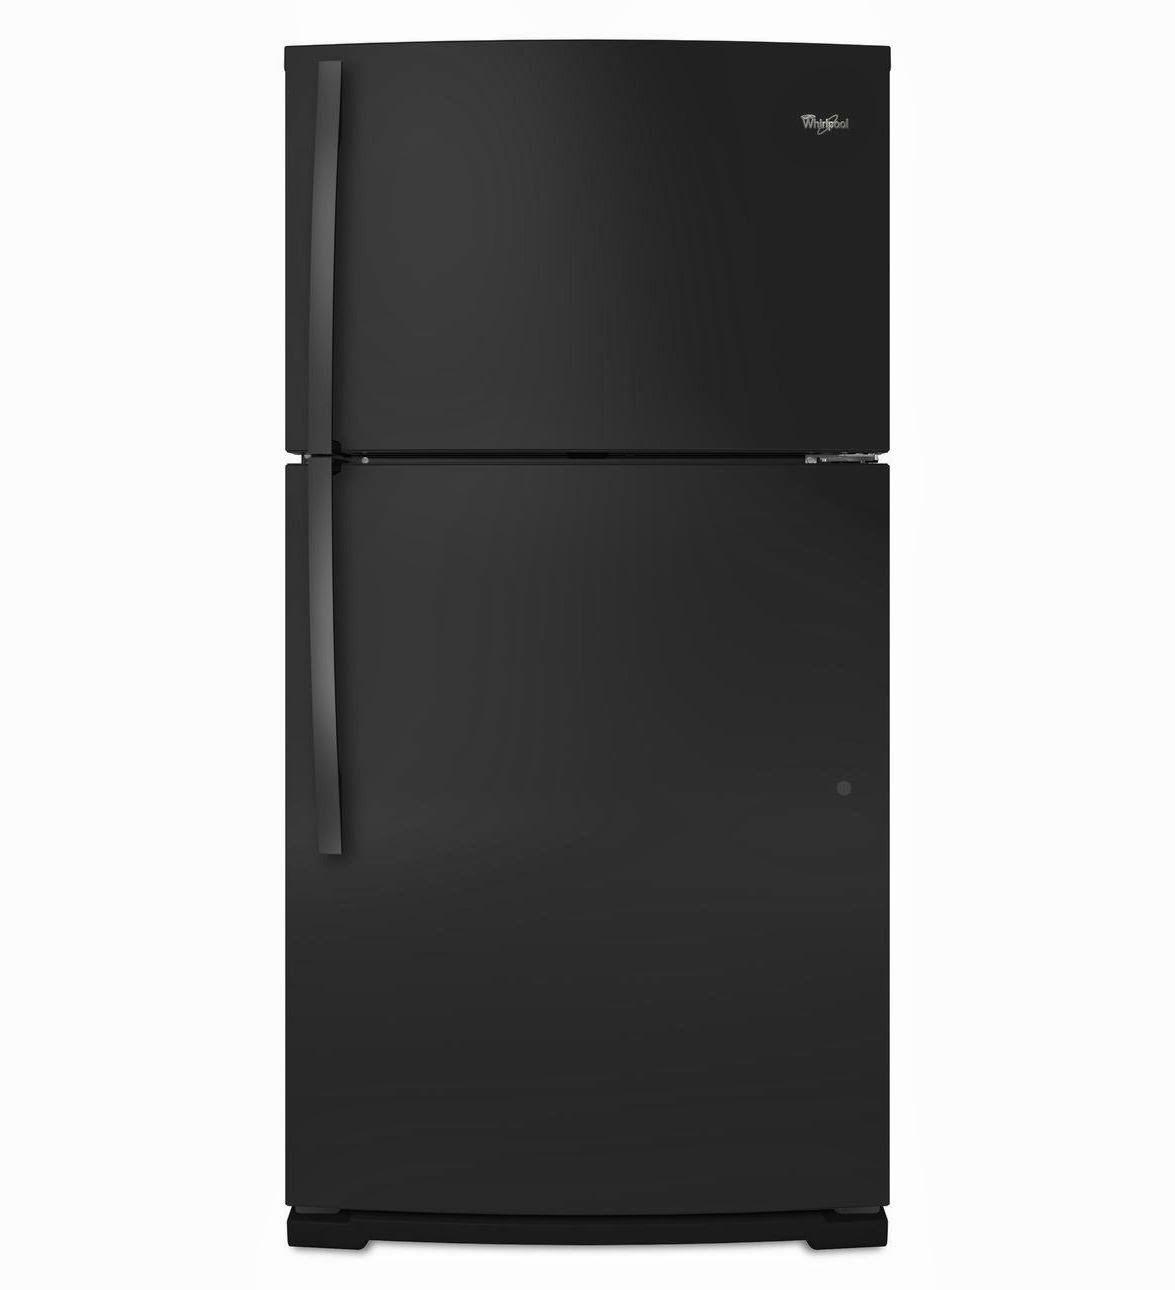 Whirlpool Refrigerator Brand Black Whirlpool Wrt371szbb